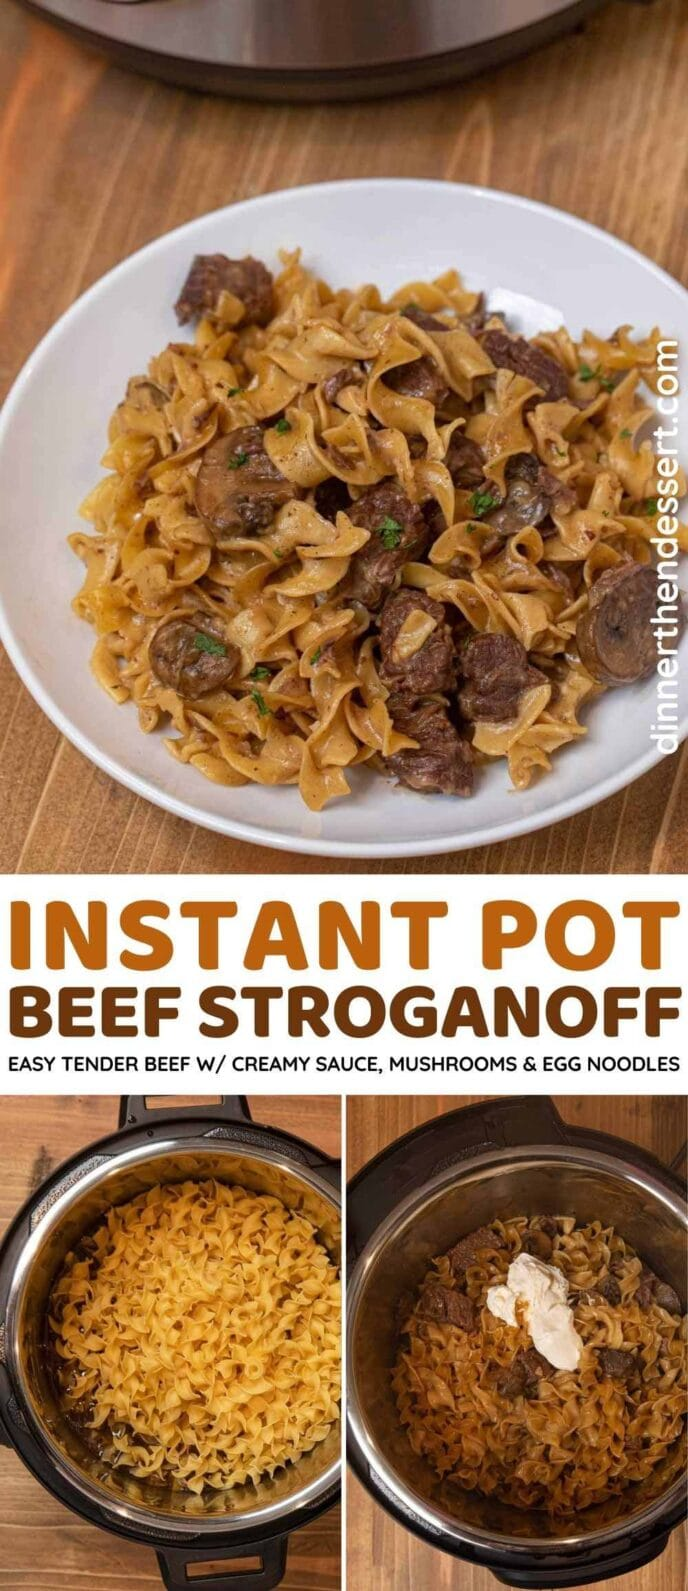 Instant Pot Beef Stroganoff collage